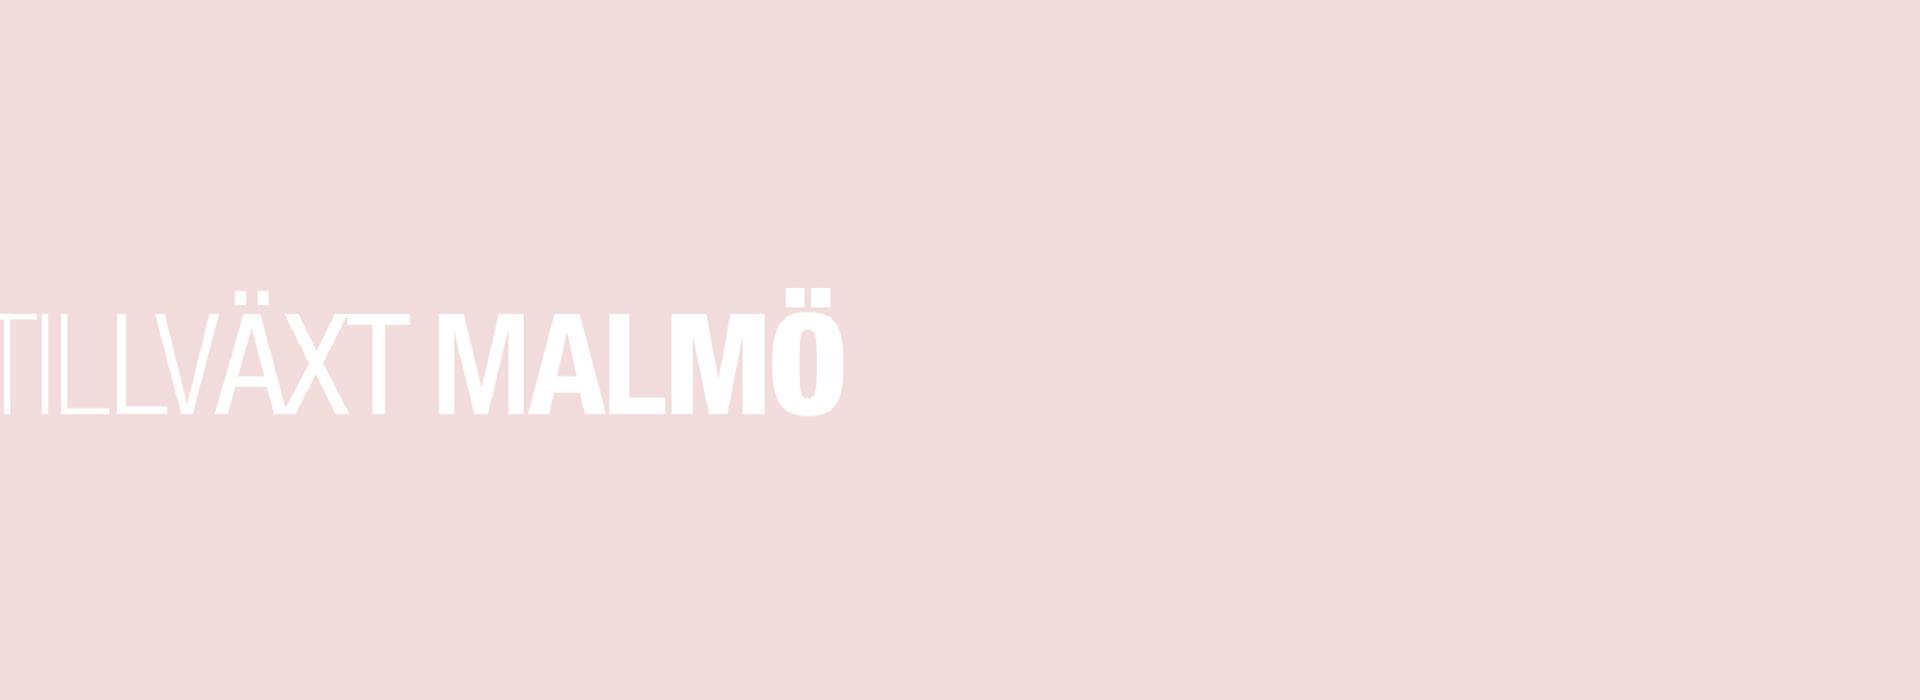 namnlo-st-3_rityta-1